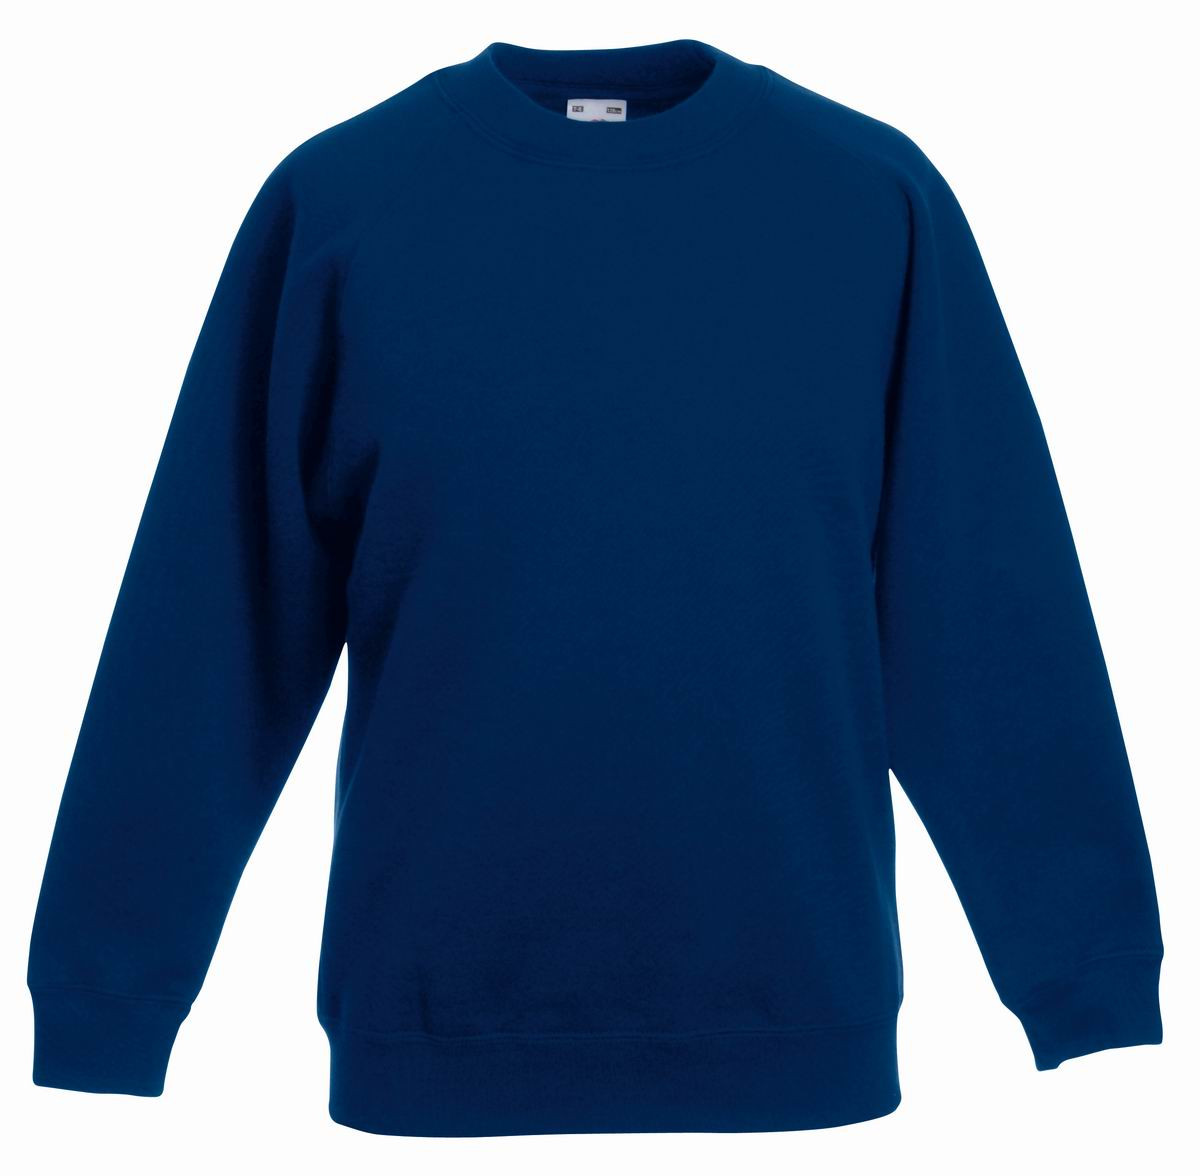 Толстовка детская Classic Kids Raglan Sweat, рост 140 (9-11лет), Тёмно-синий